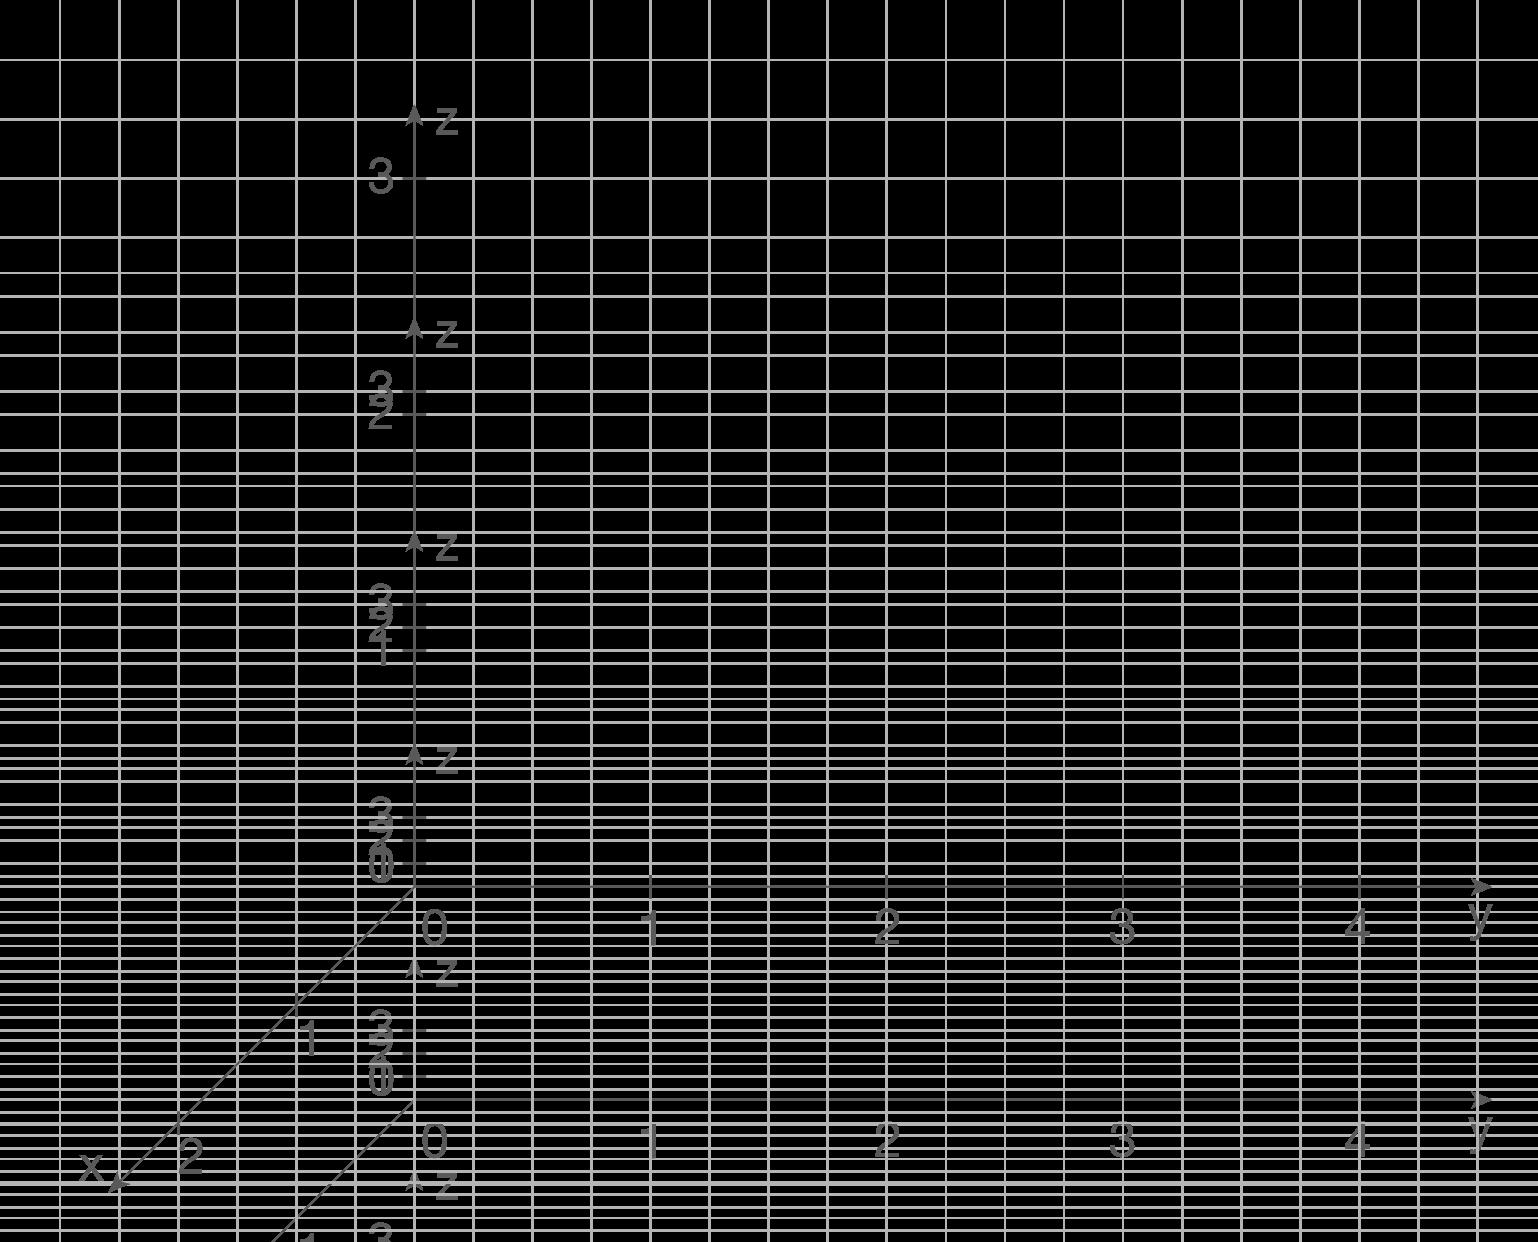 B1 - Analytische Geometrie